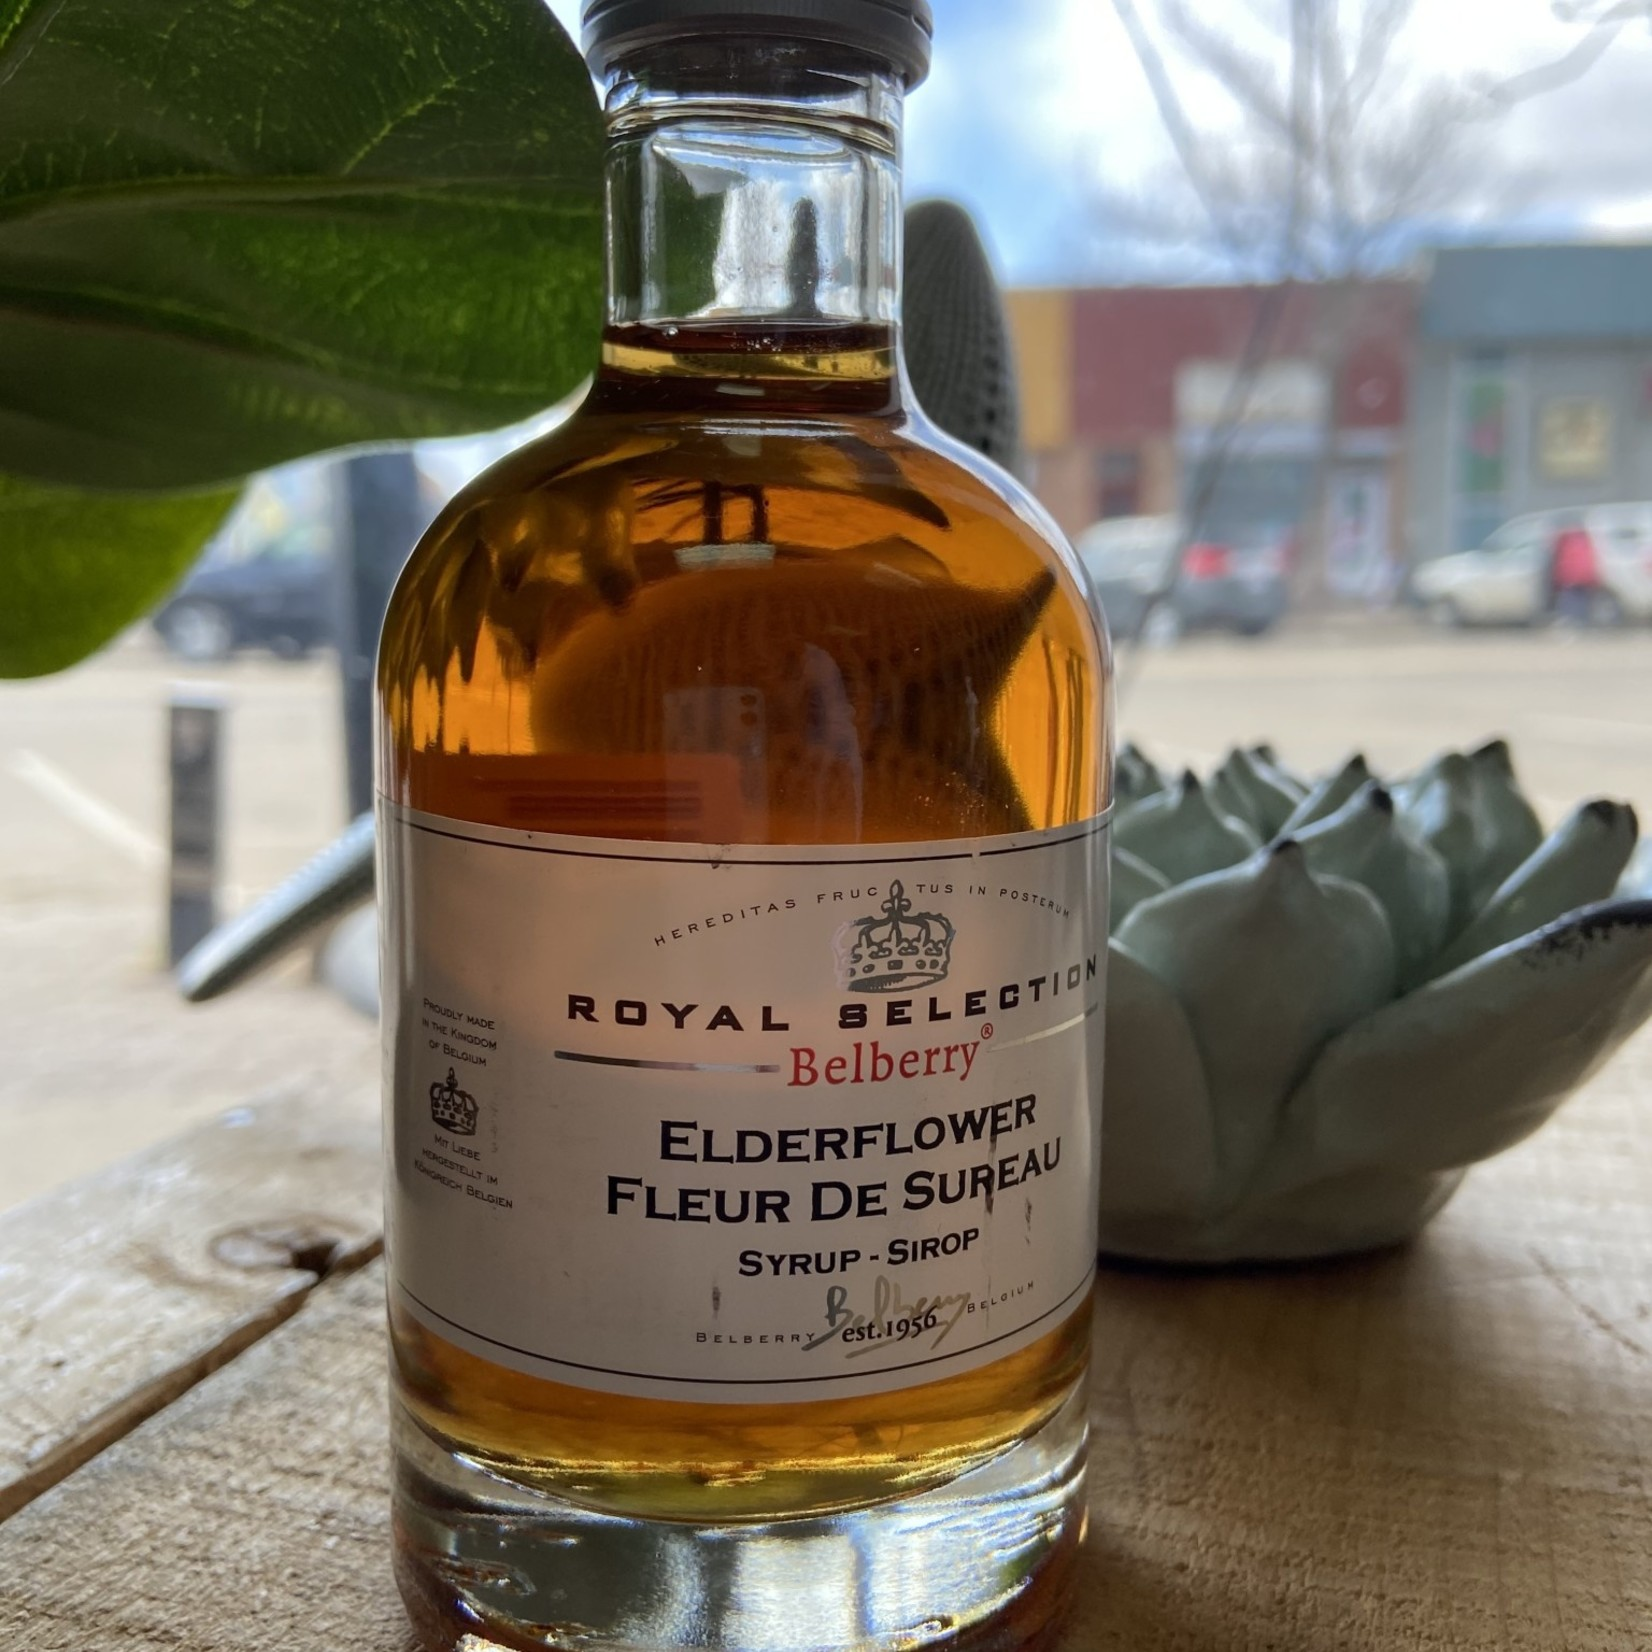 Dovetale Bilberry Elderflower Syrup